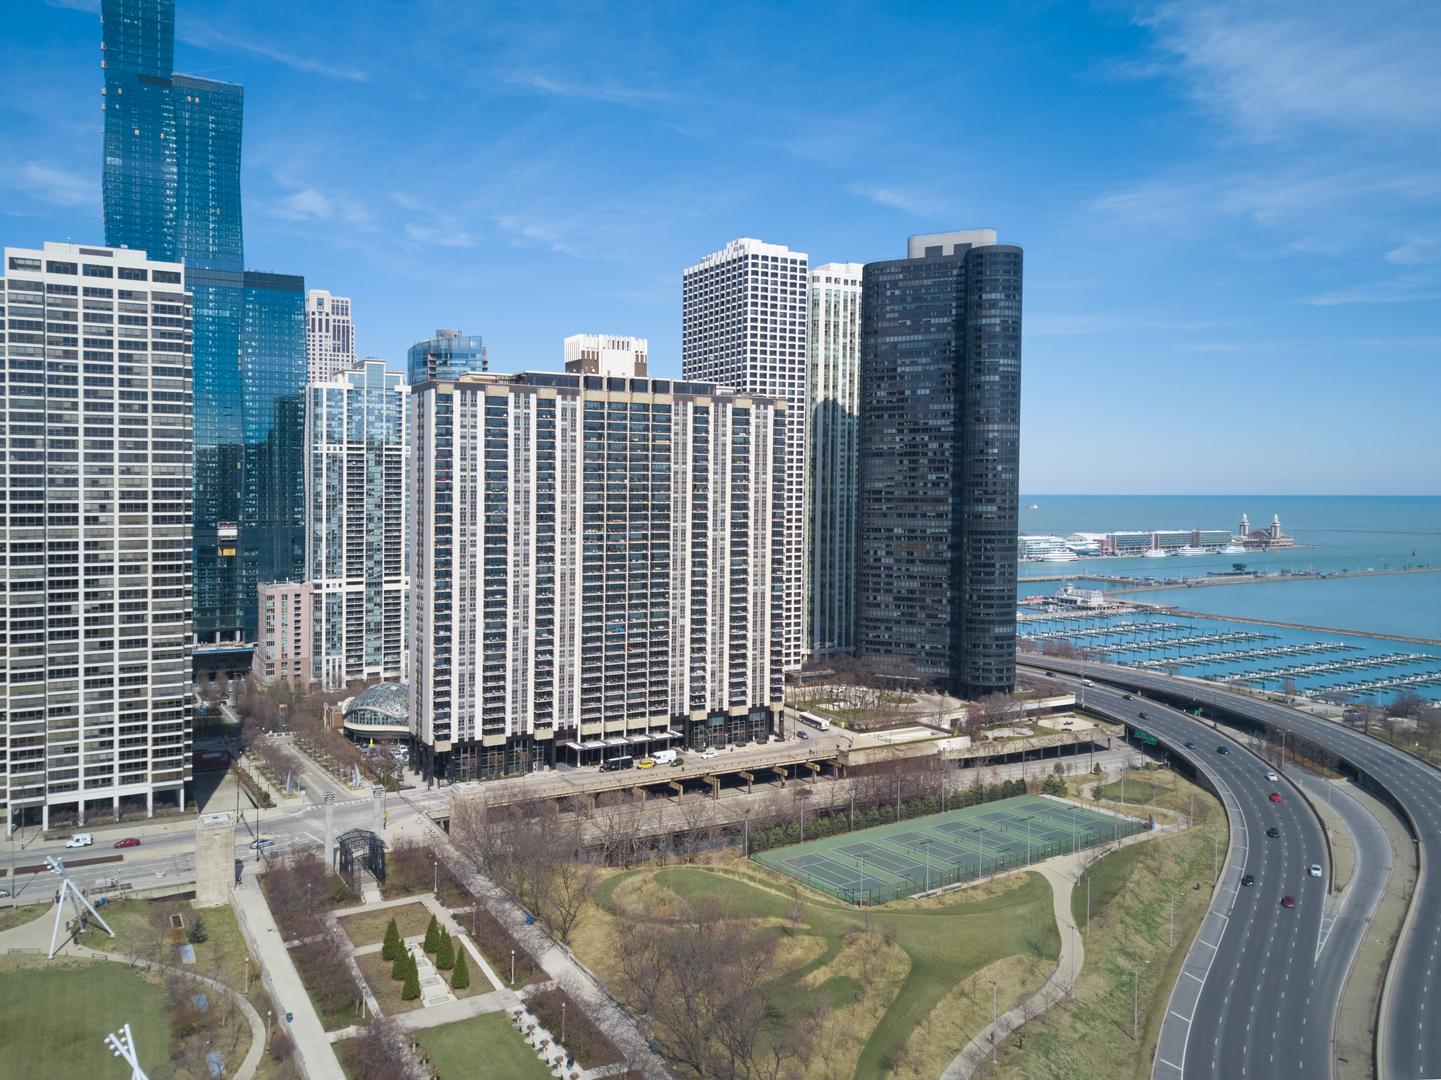 400 Randolph Unit Unit 1125 ,Chicago, Illinois 60601